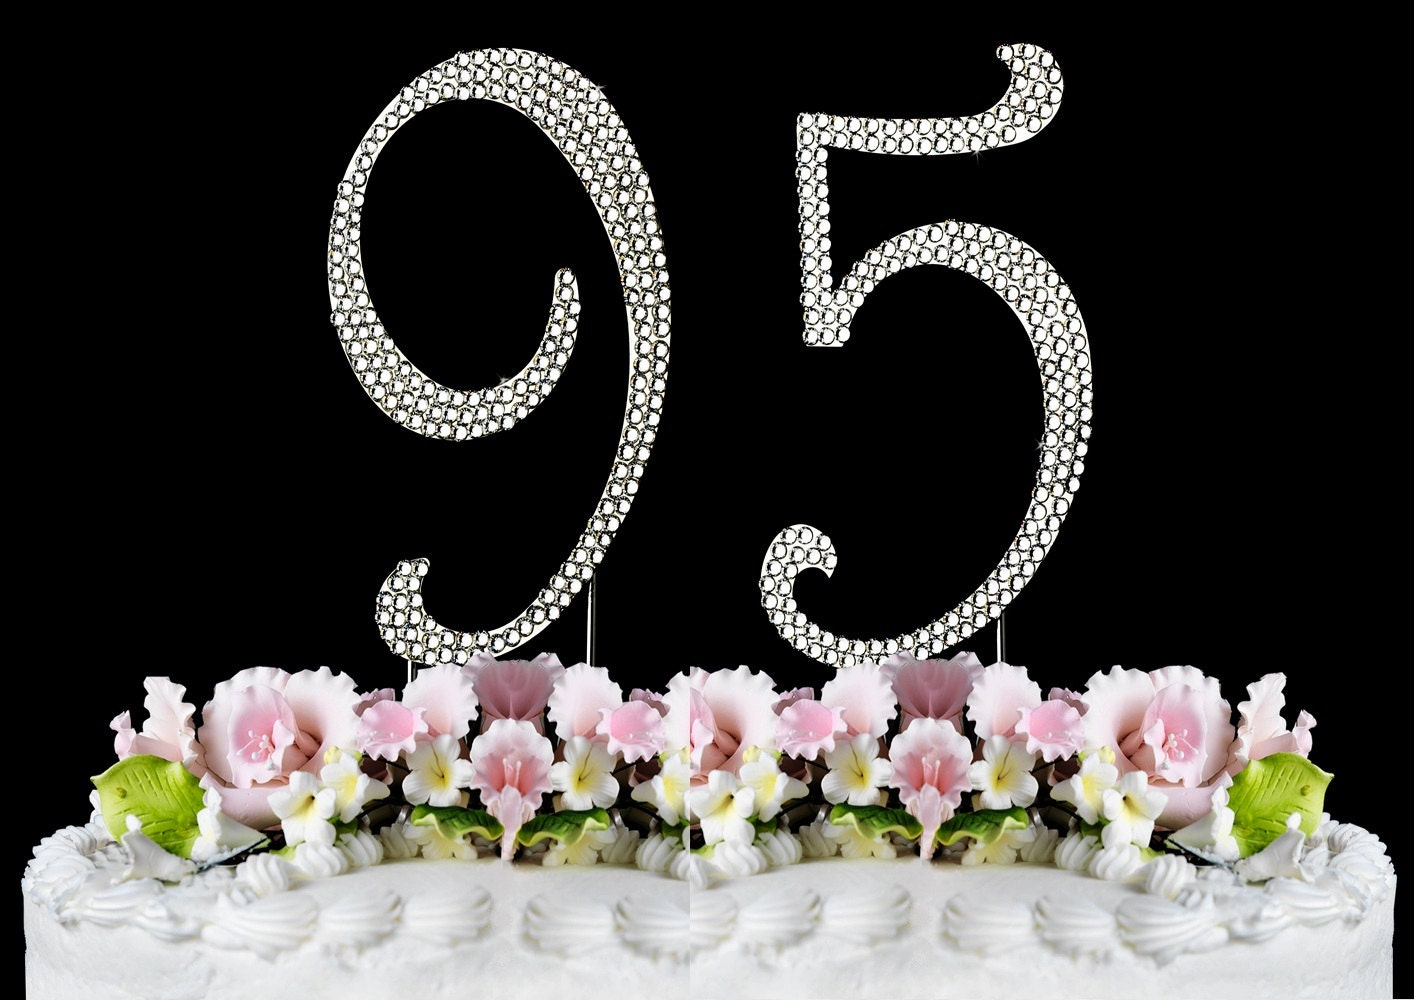 New Large Rhinestone Number 95 Cake Topper 95th Birthday